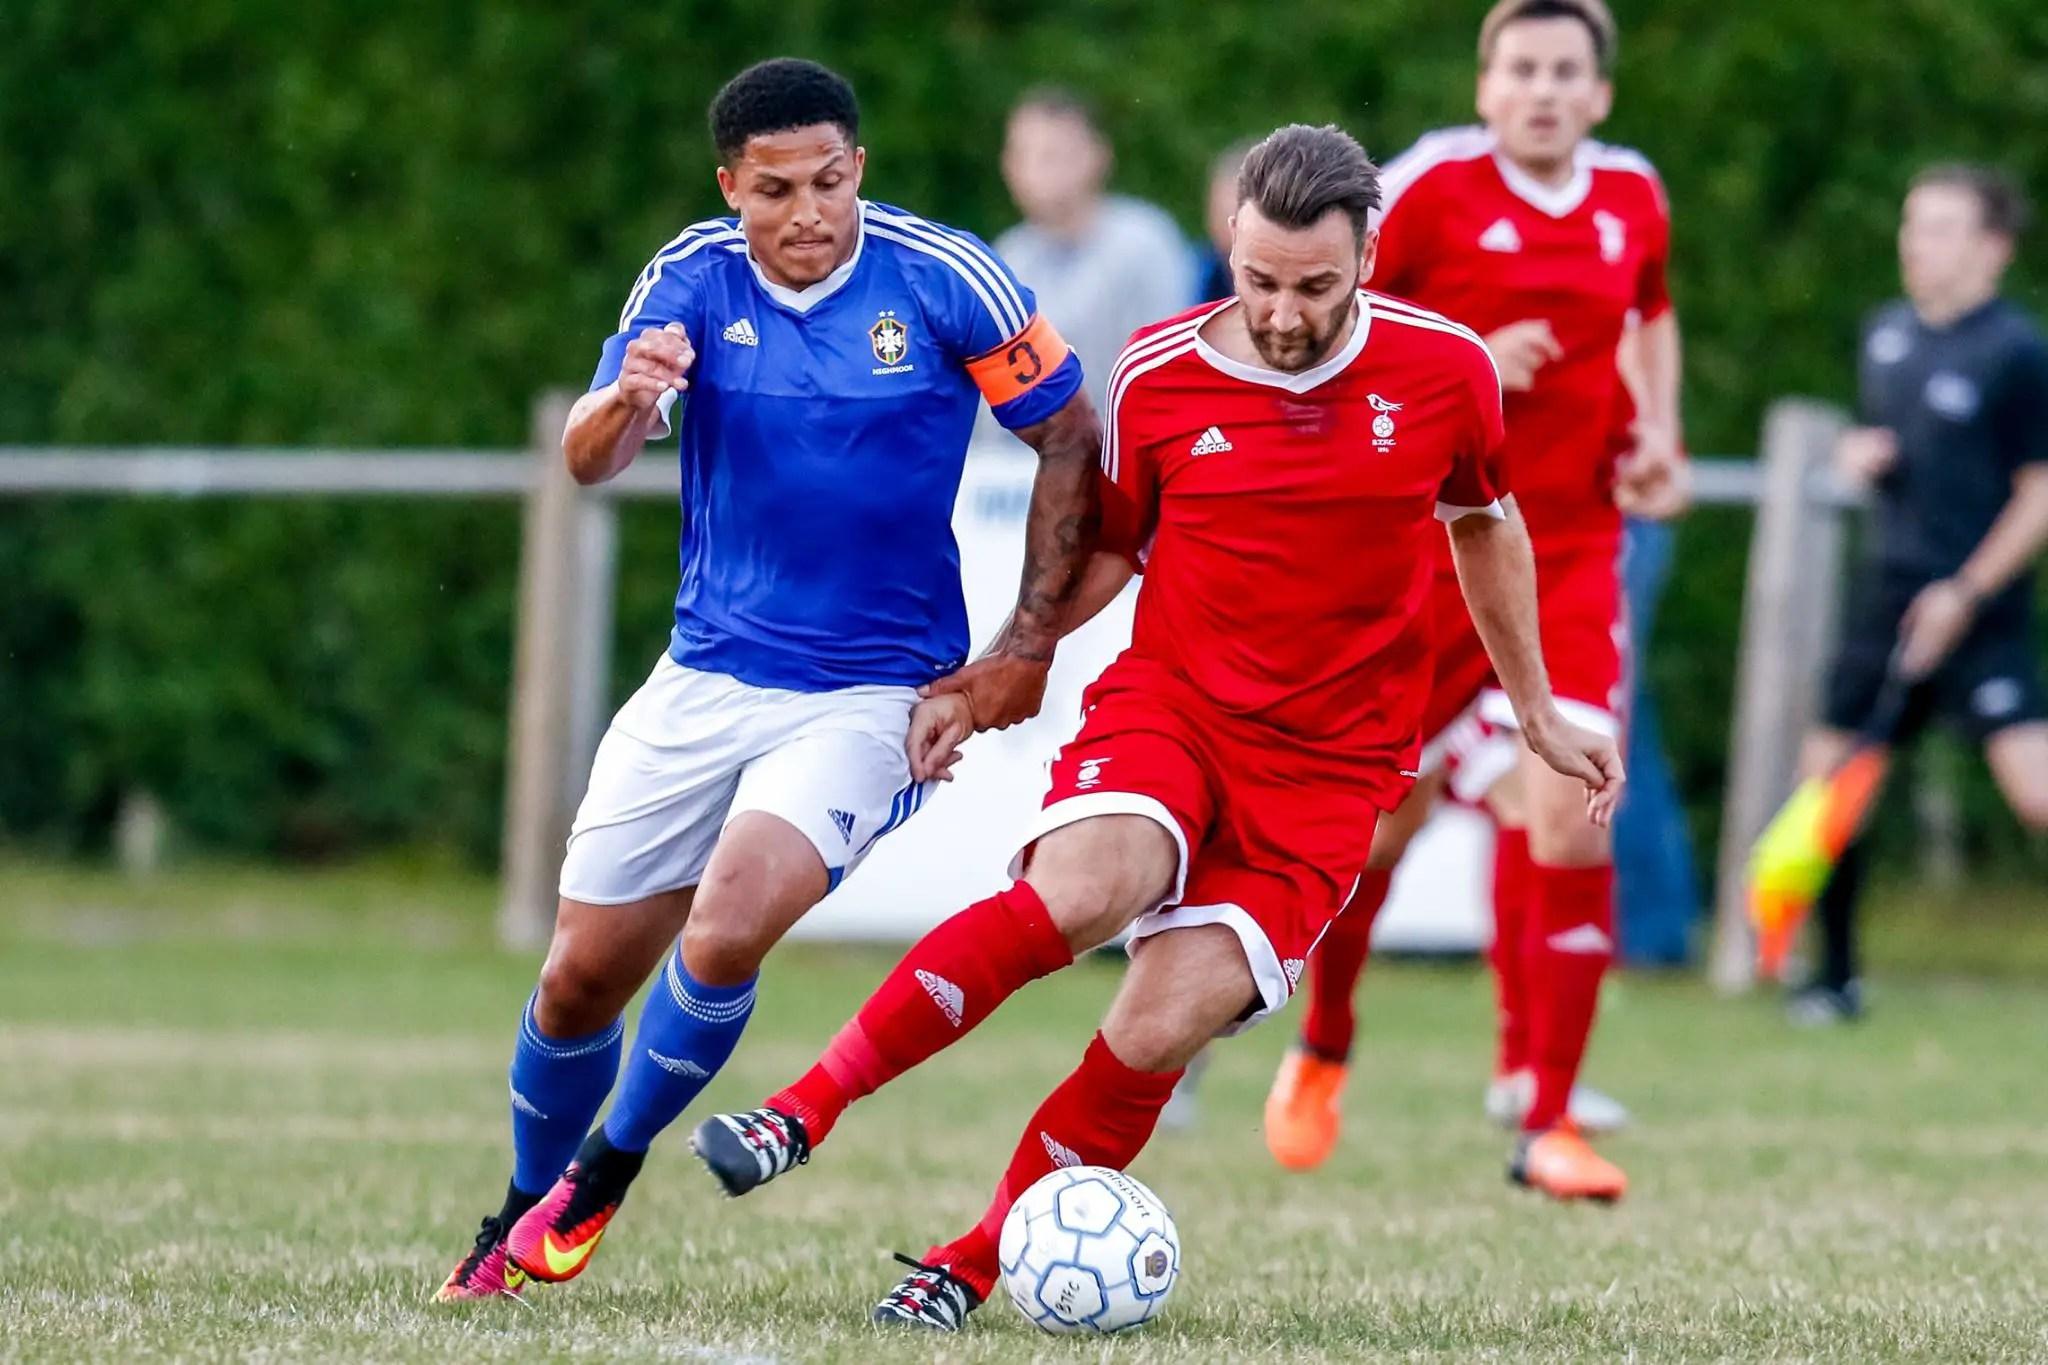 Hellenic Prem: Adam Cornell gets Bracknell Town FC back on track